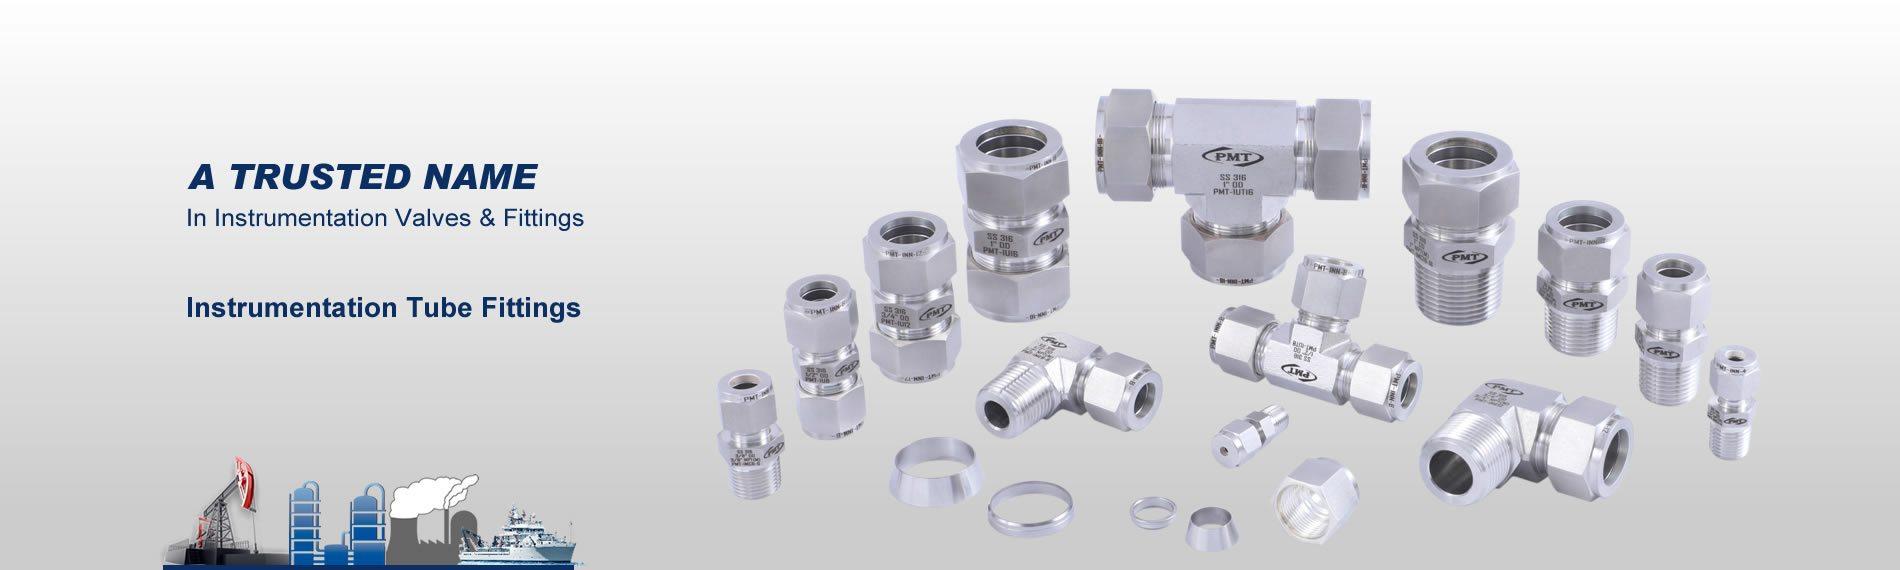 Pmt engineers instrumentation valves needle